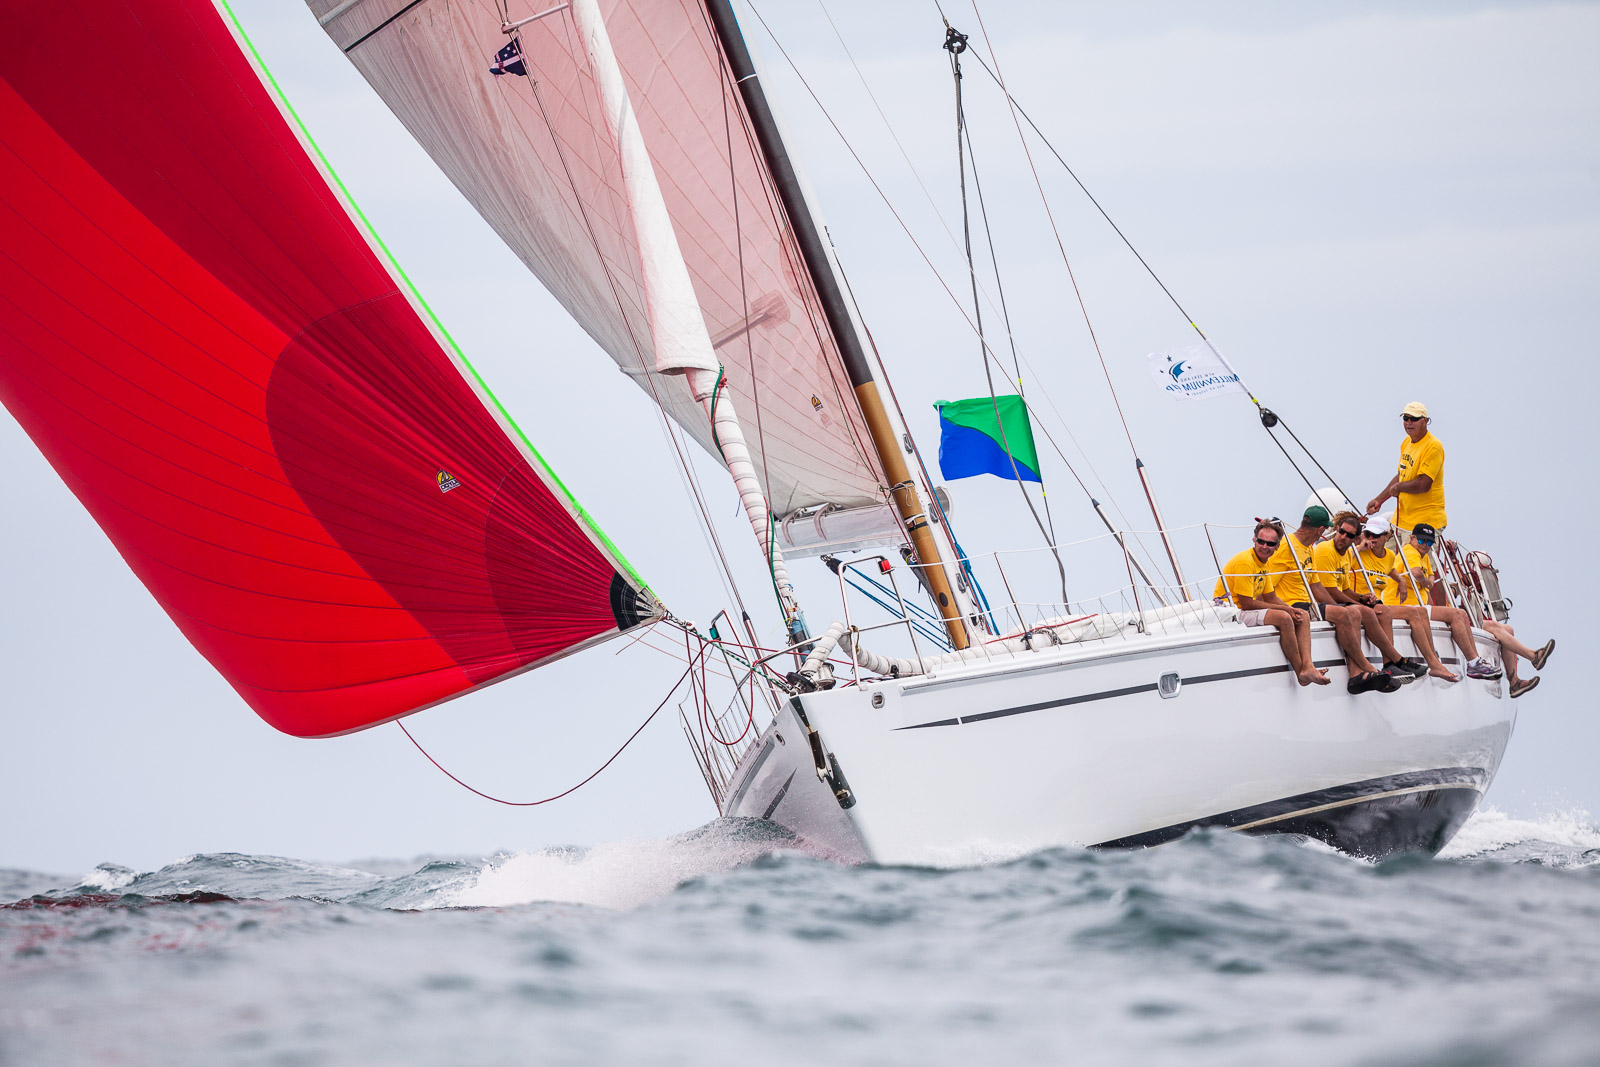 Sailing yacht Antaeus - Photo by Jeff Brown